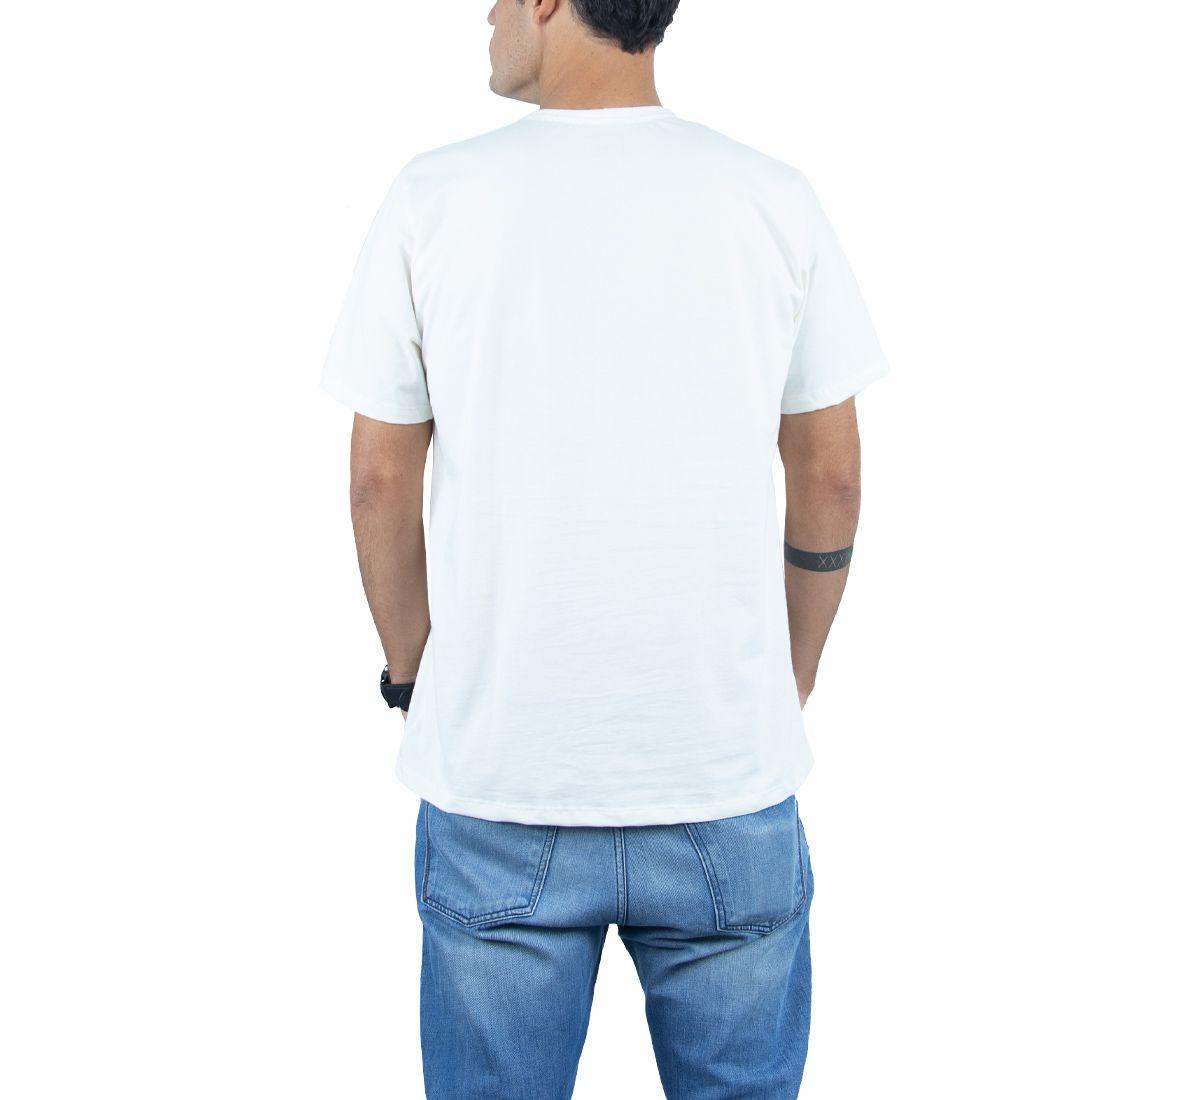 Camiseta California Masc - Off White - Woom 247